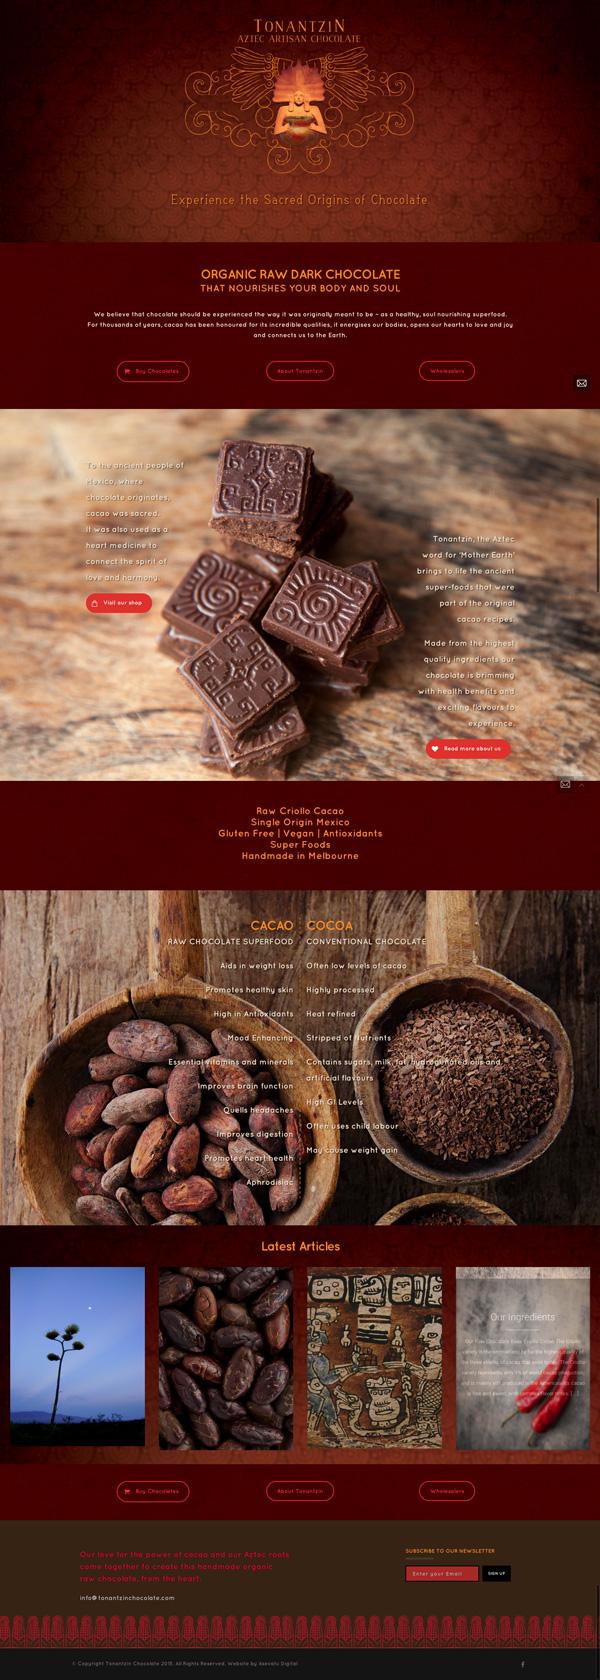 Tonantzin-Chocolate-__-The-Sacred-Origins-of_-https___tonantzinchocolate.com_